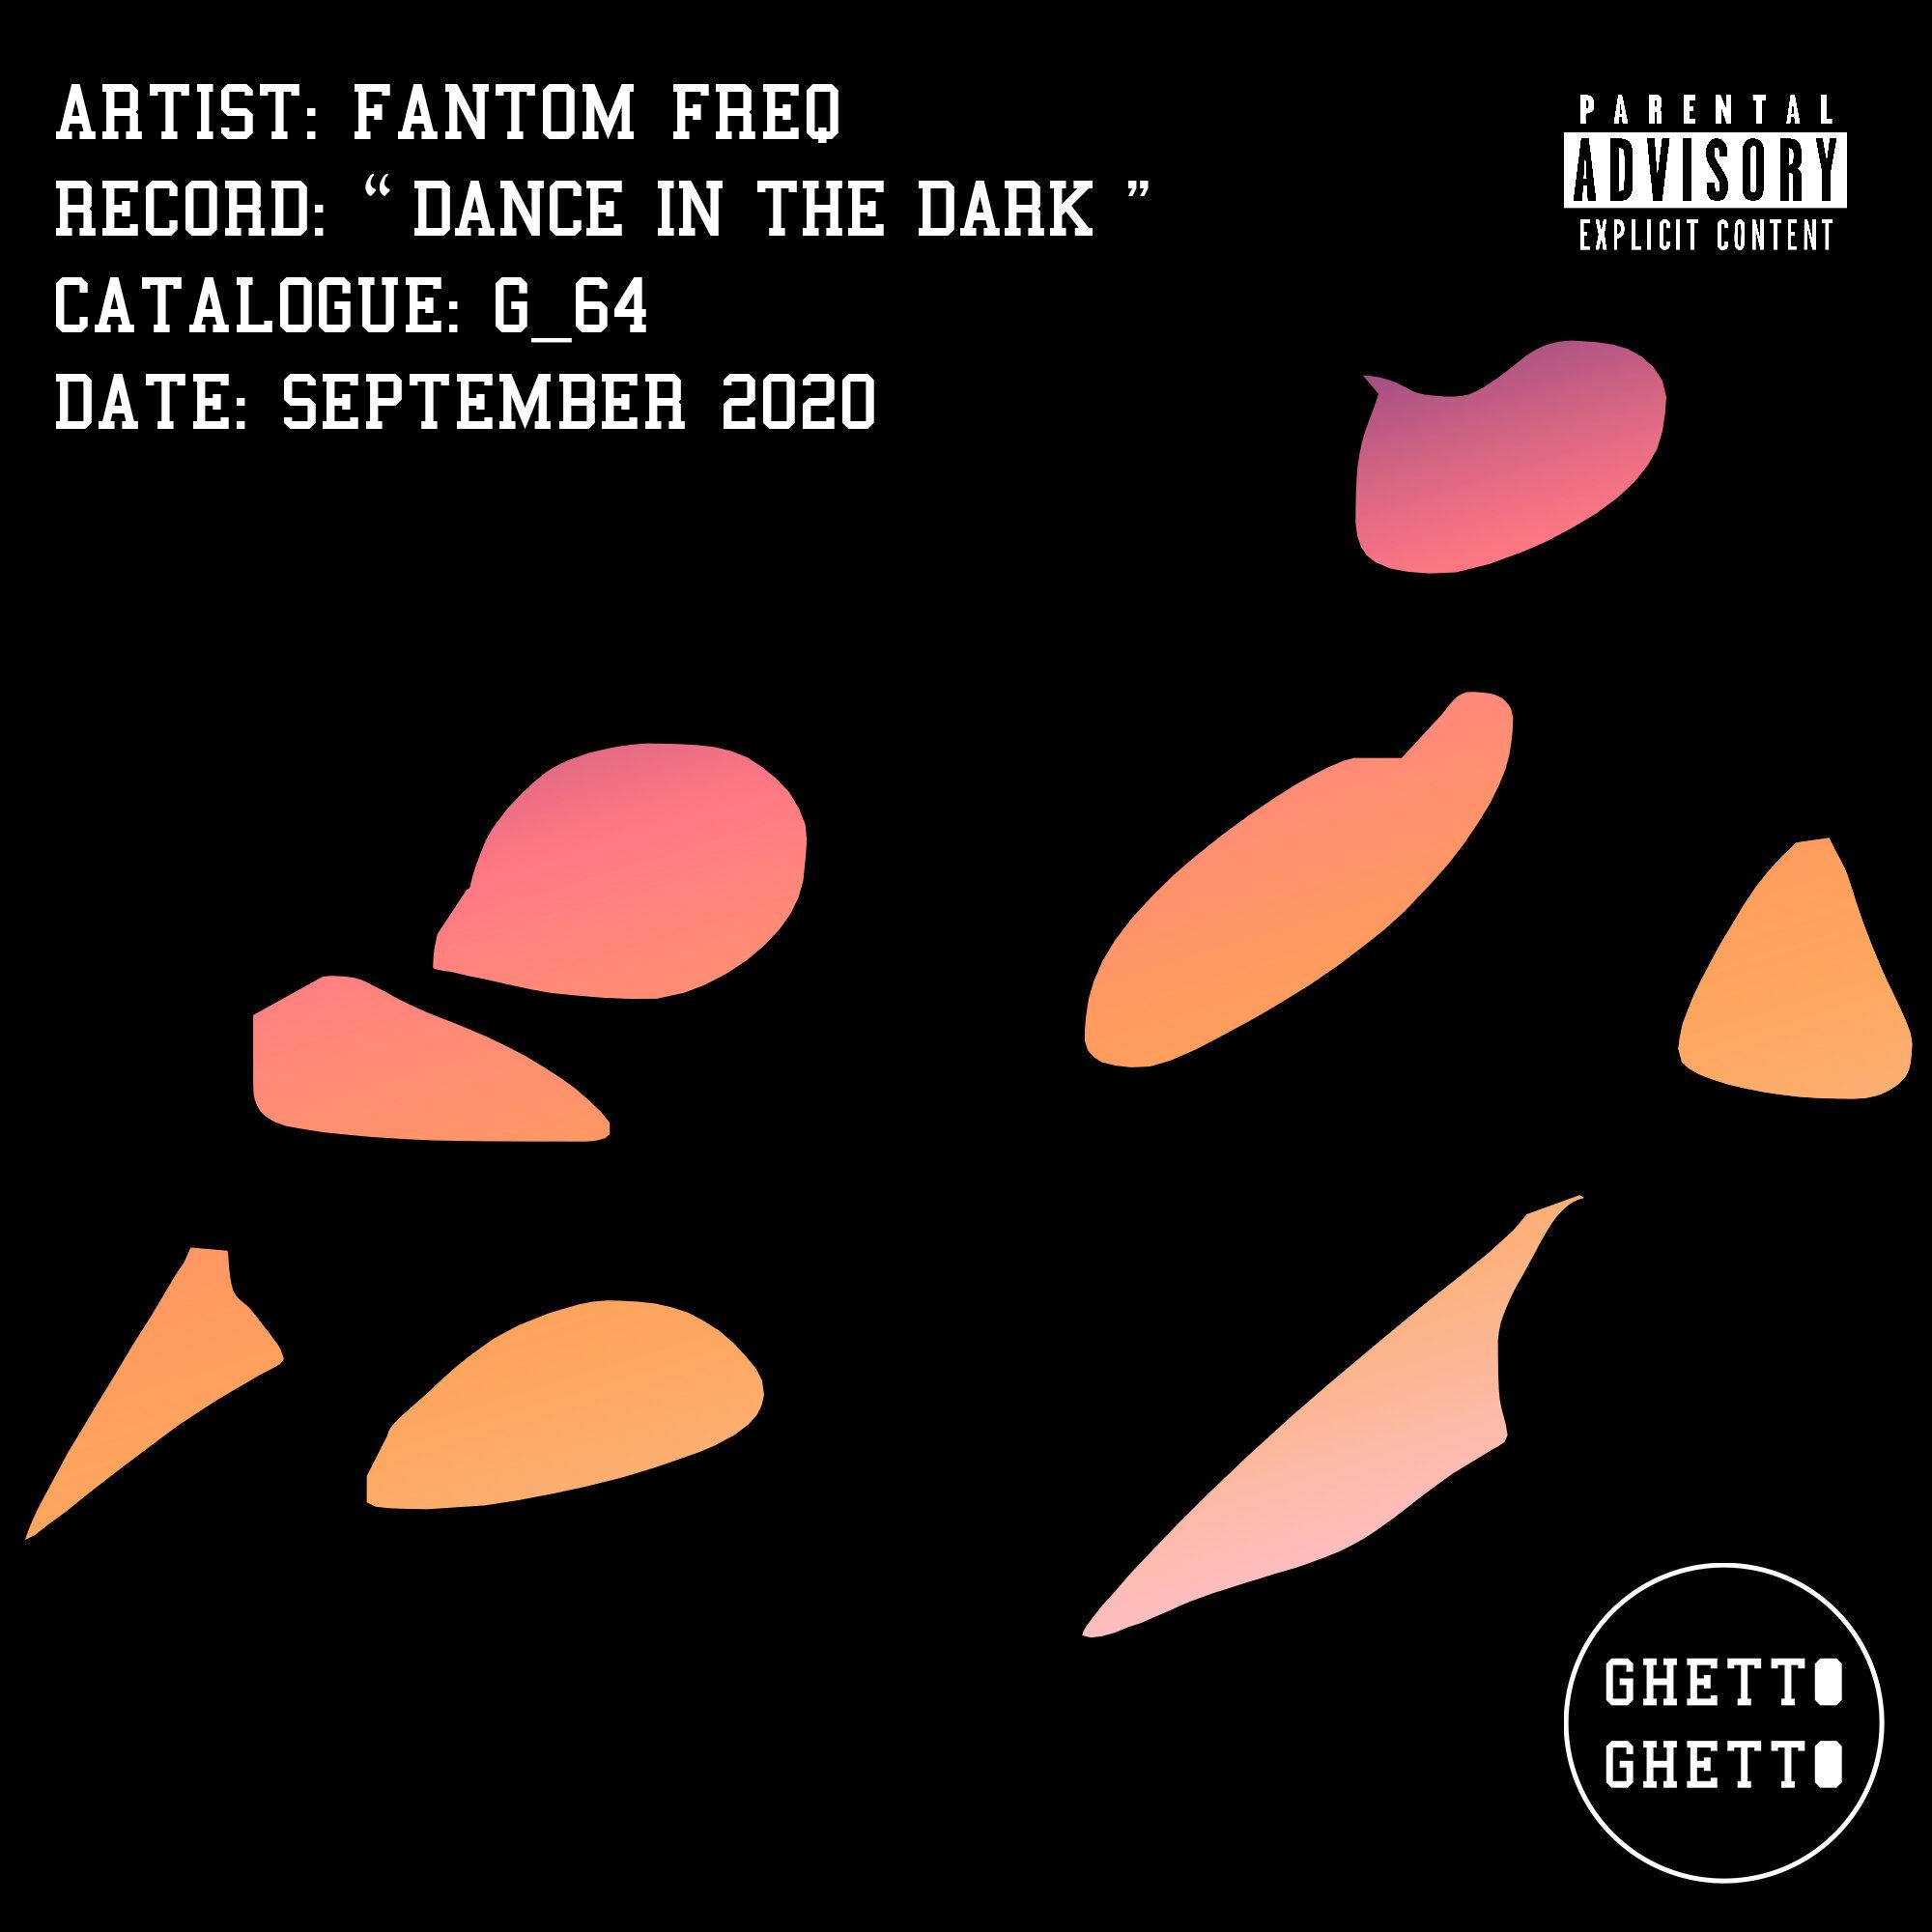 G_64 - Dance in the Dark